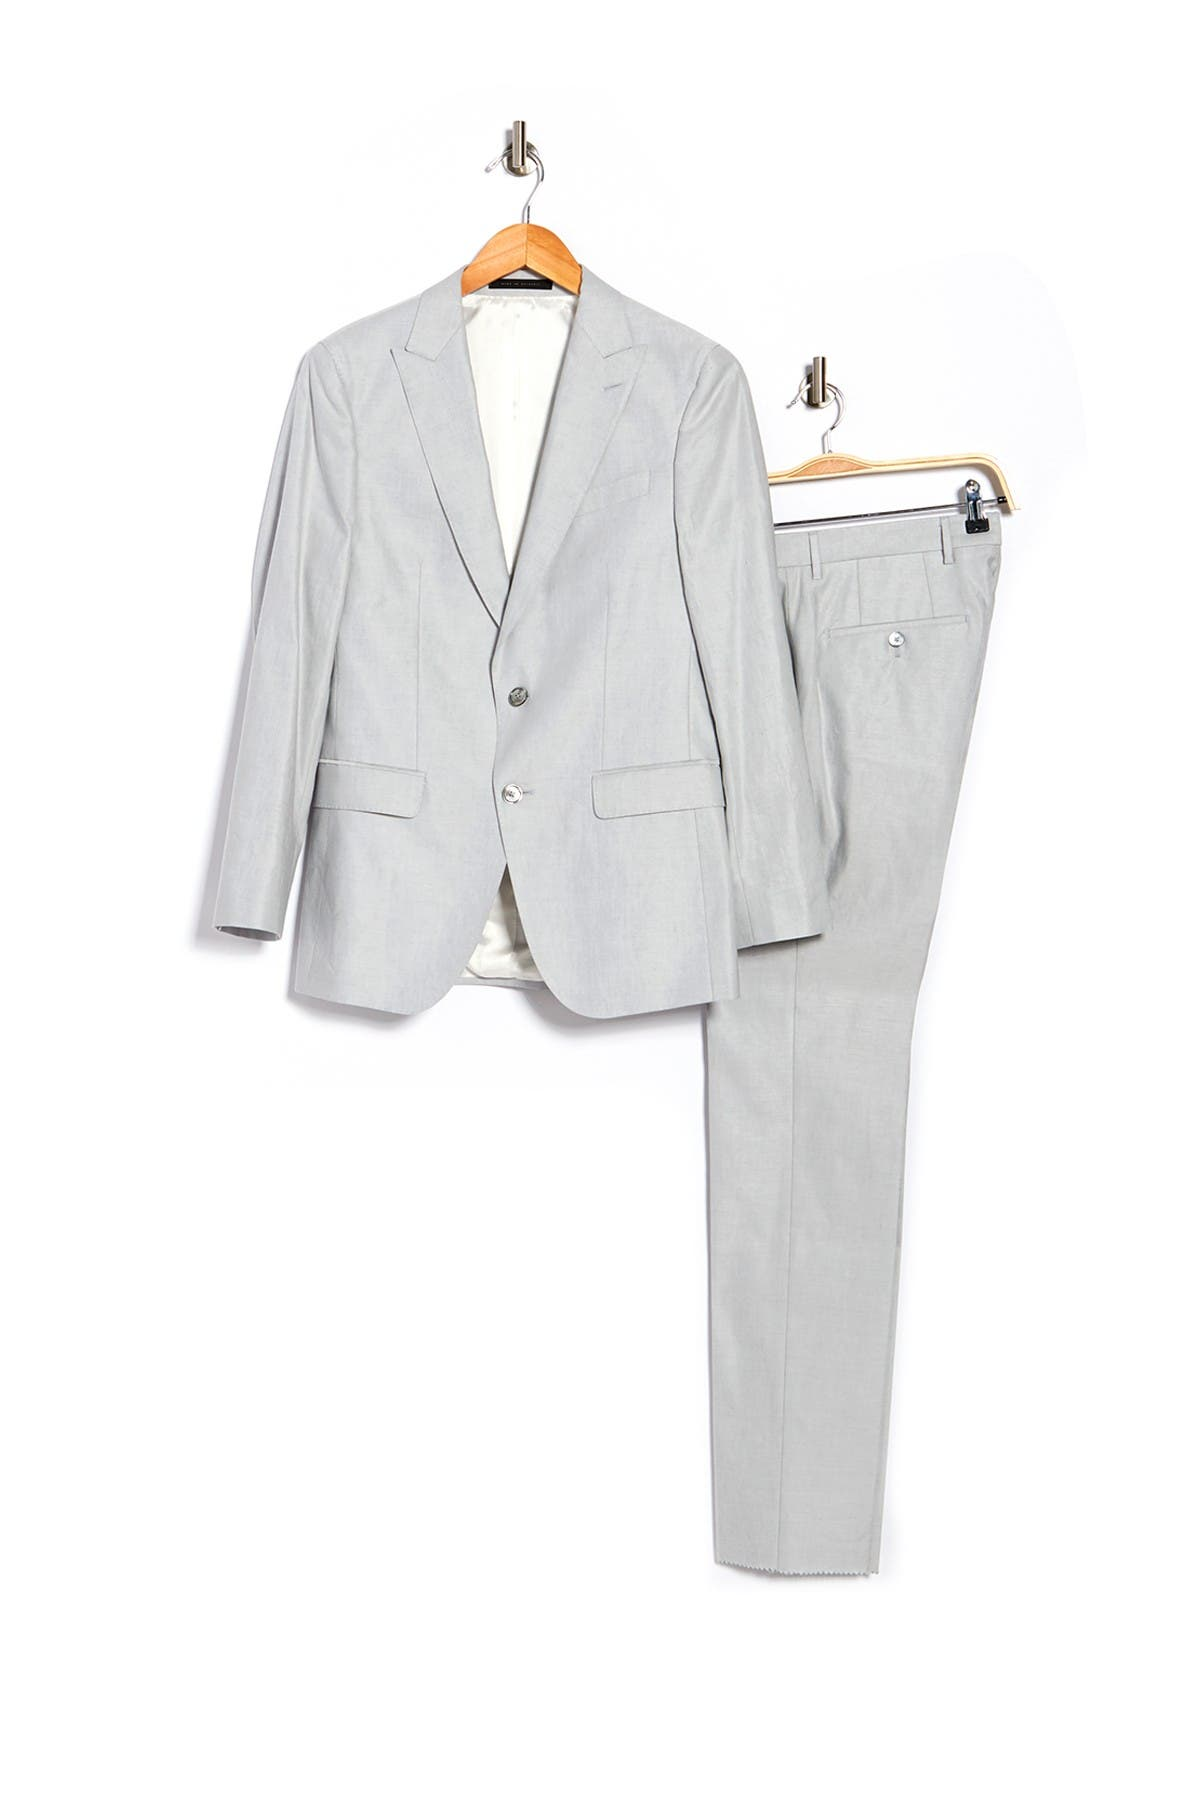 Image of BOSS Solid Notch Collar Linen Blend Jacket & Pants Suit Set